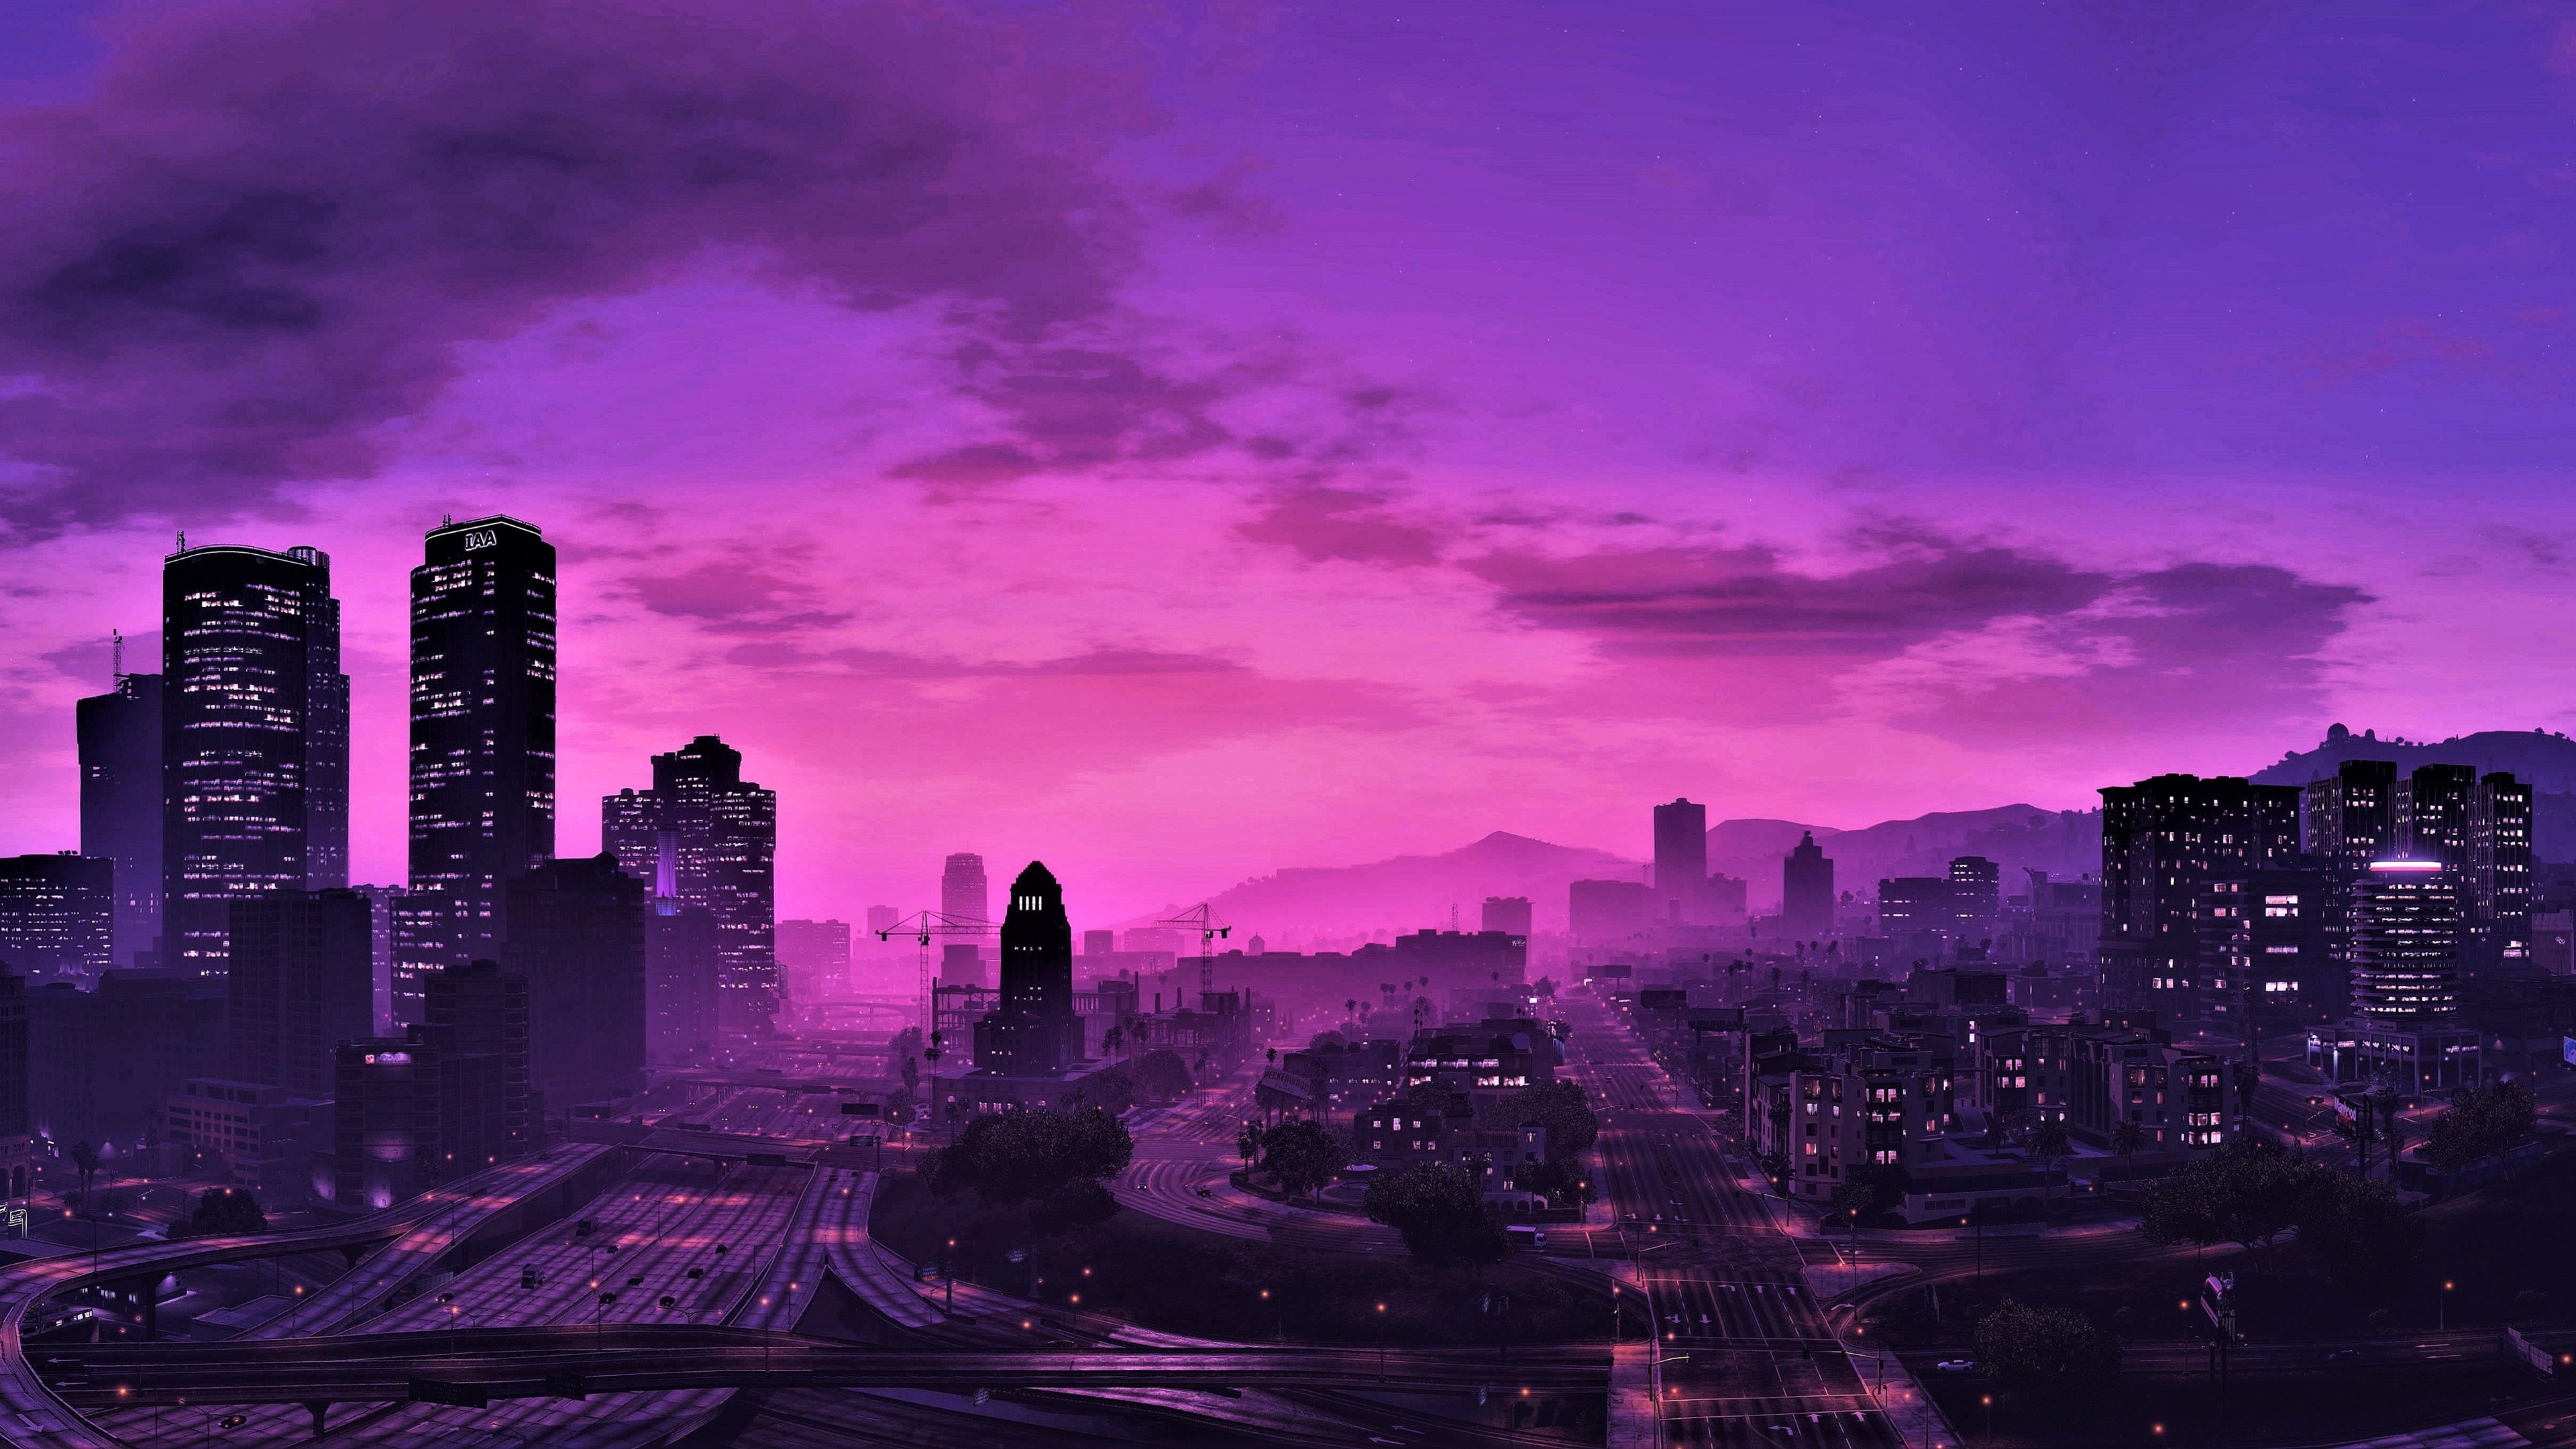 Gta 5 夜の街 紫色のスタイル 高層ビル 1242x2688 Iphone 11 Pro Xs